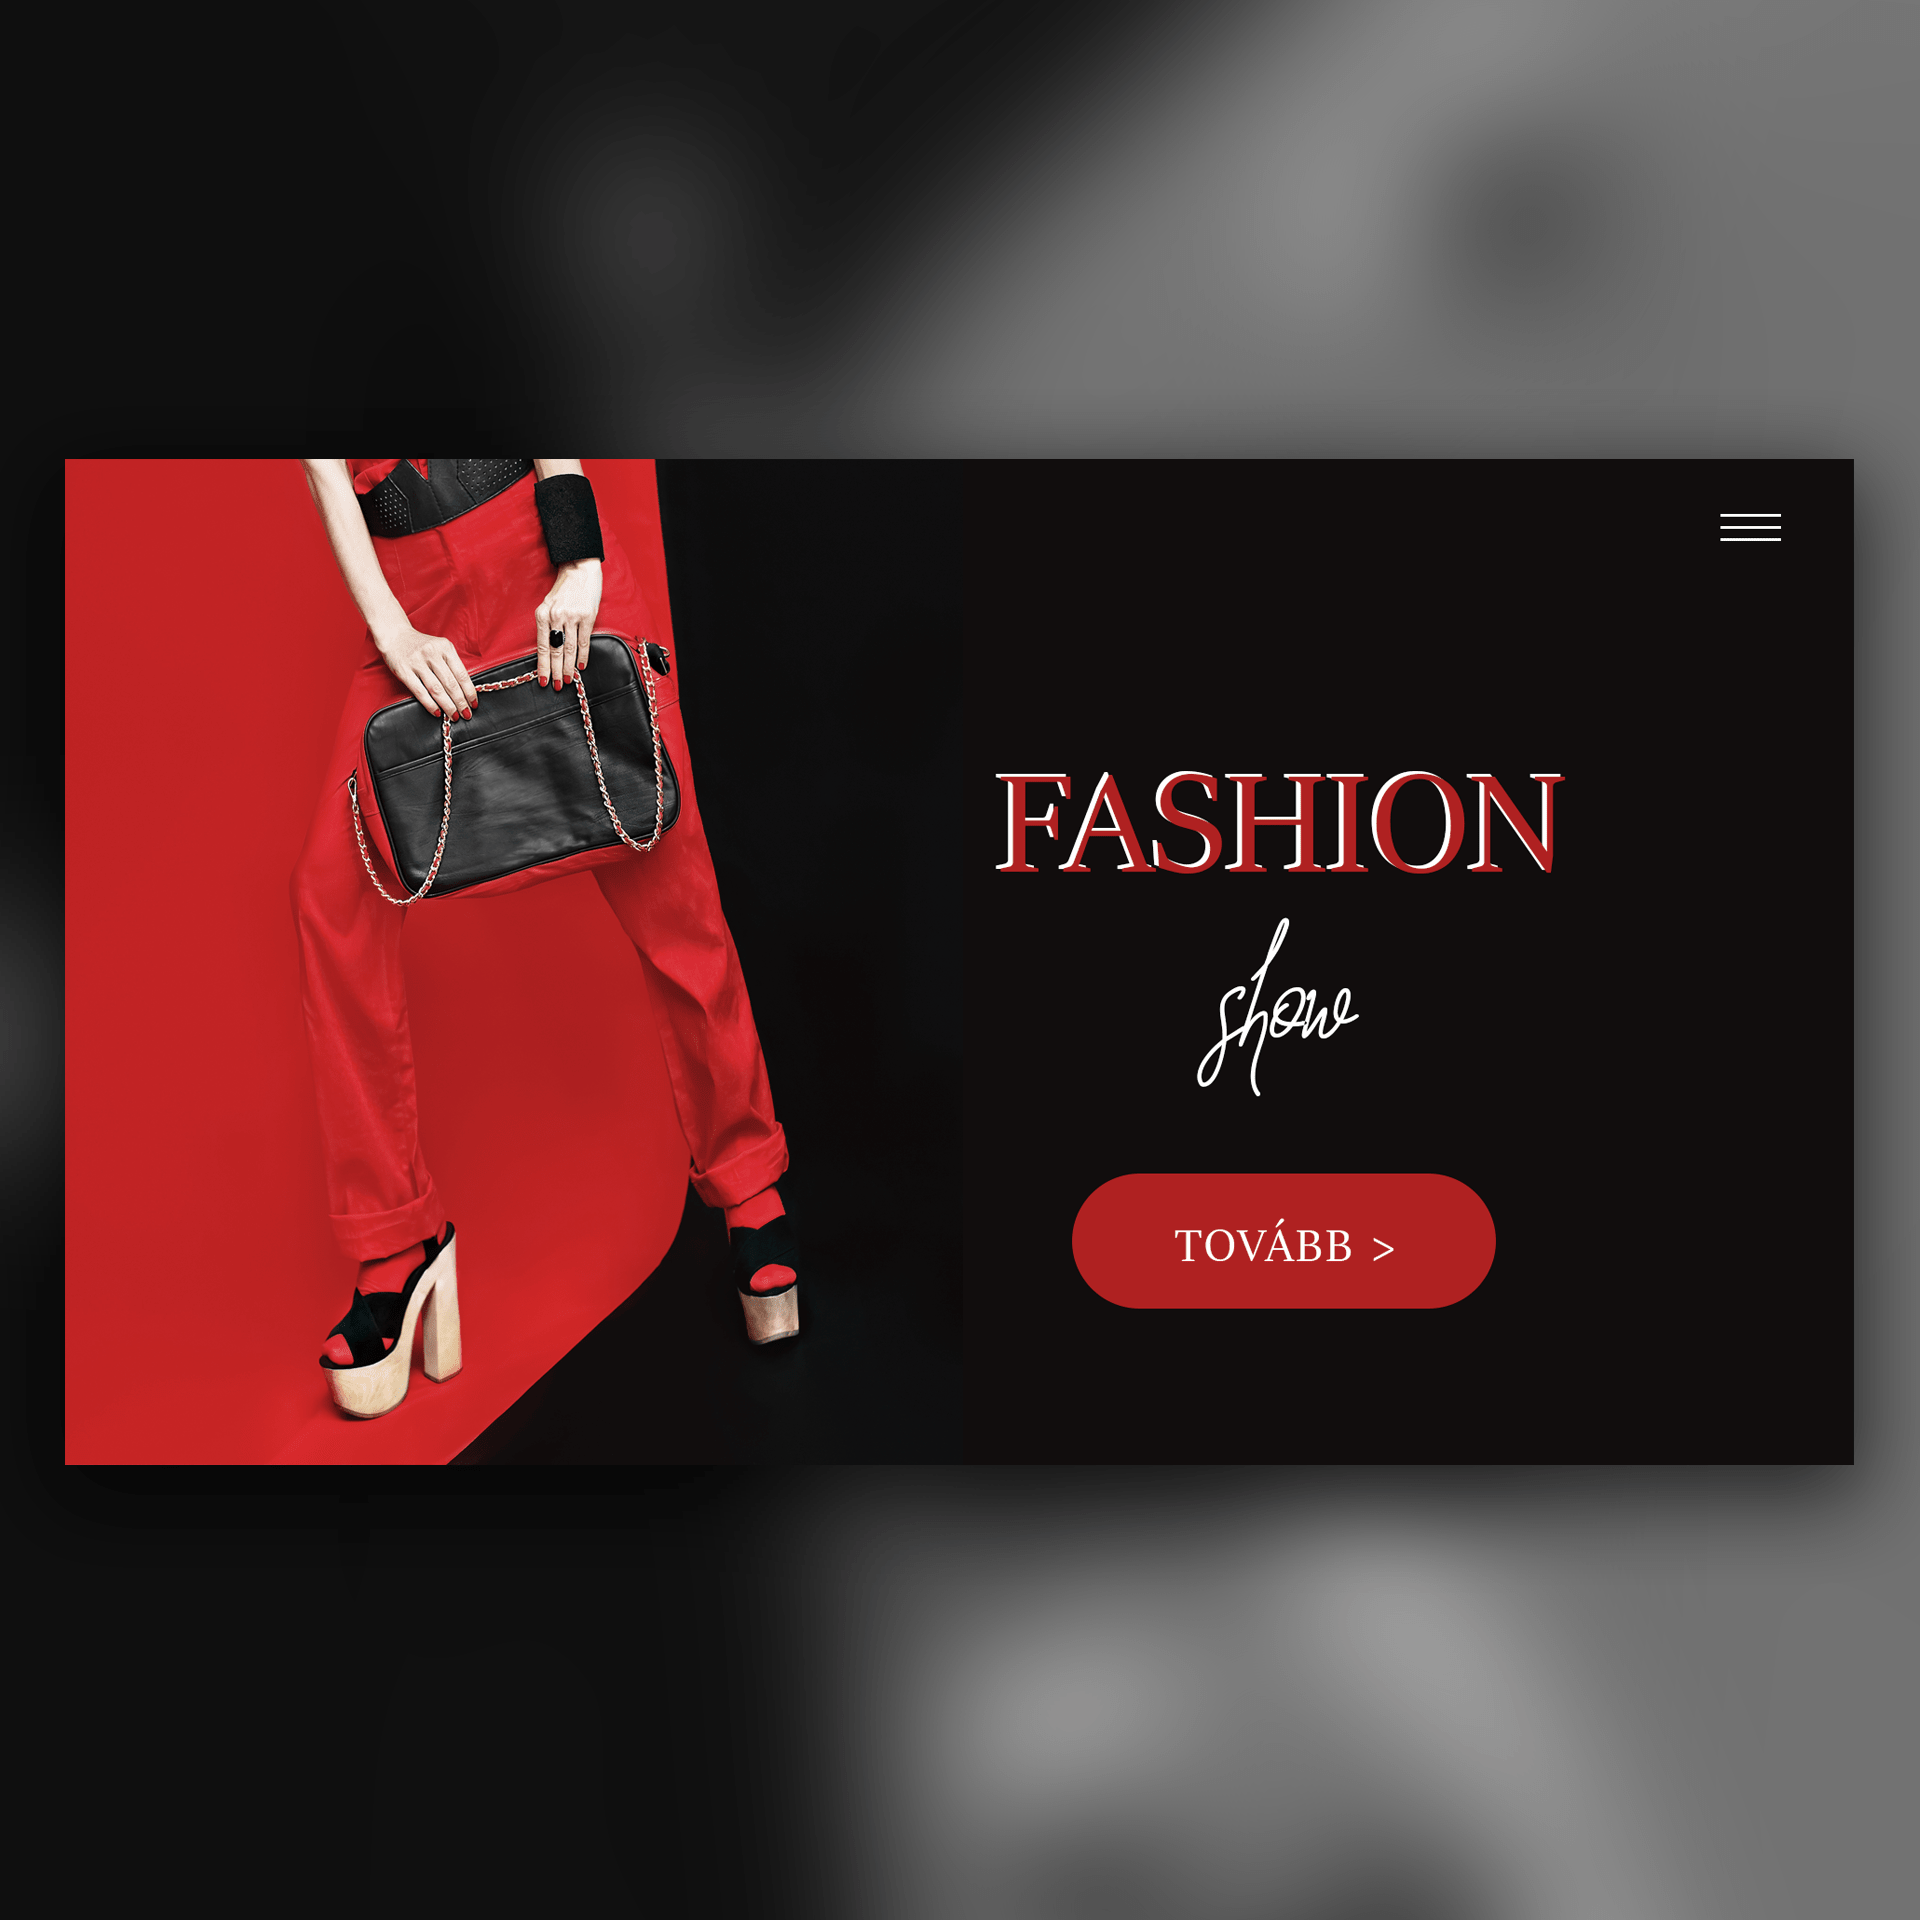 Fashion-show-weboldal-terv